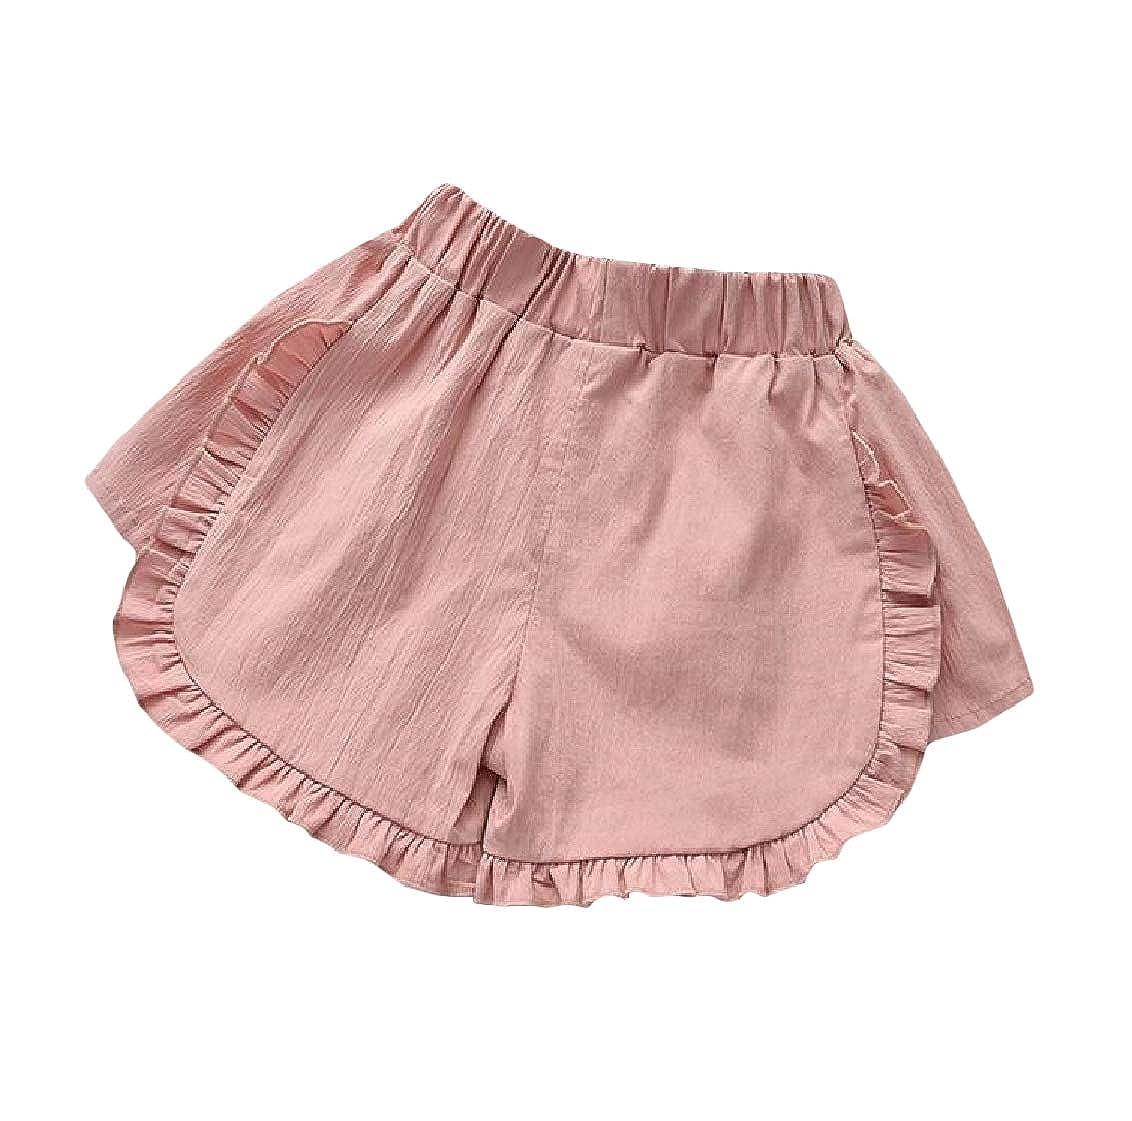 Hajotrawa Girls Simple Loose Solid Elastic Waist Trim Cute Shorts